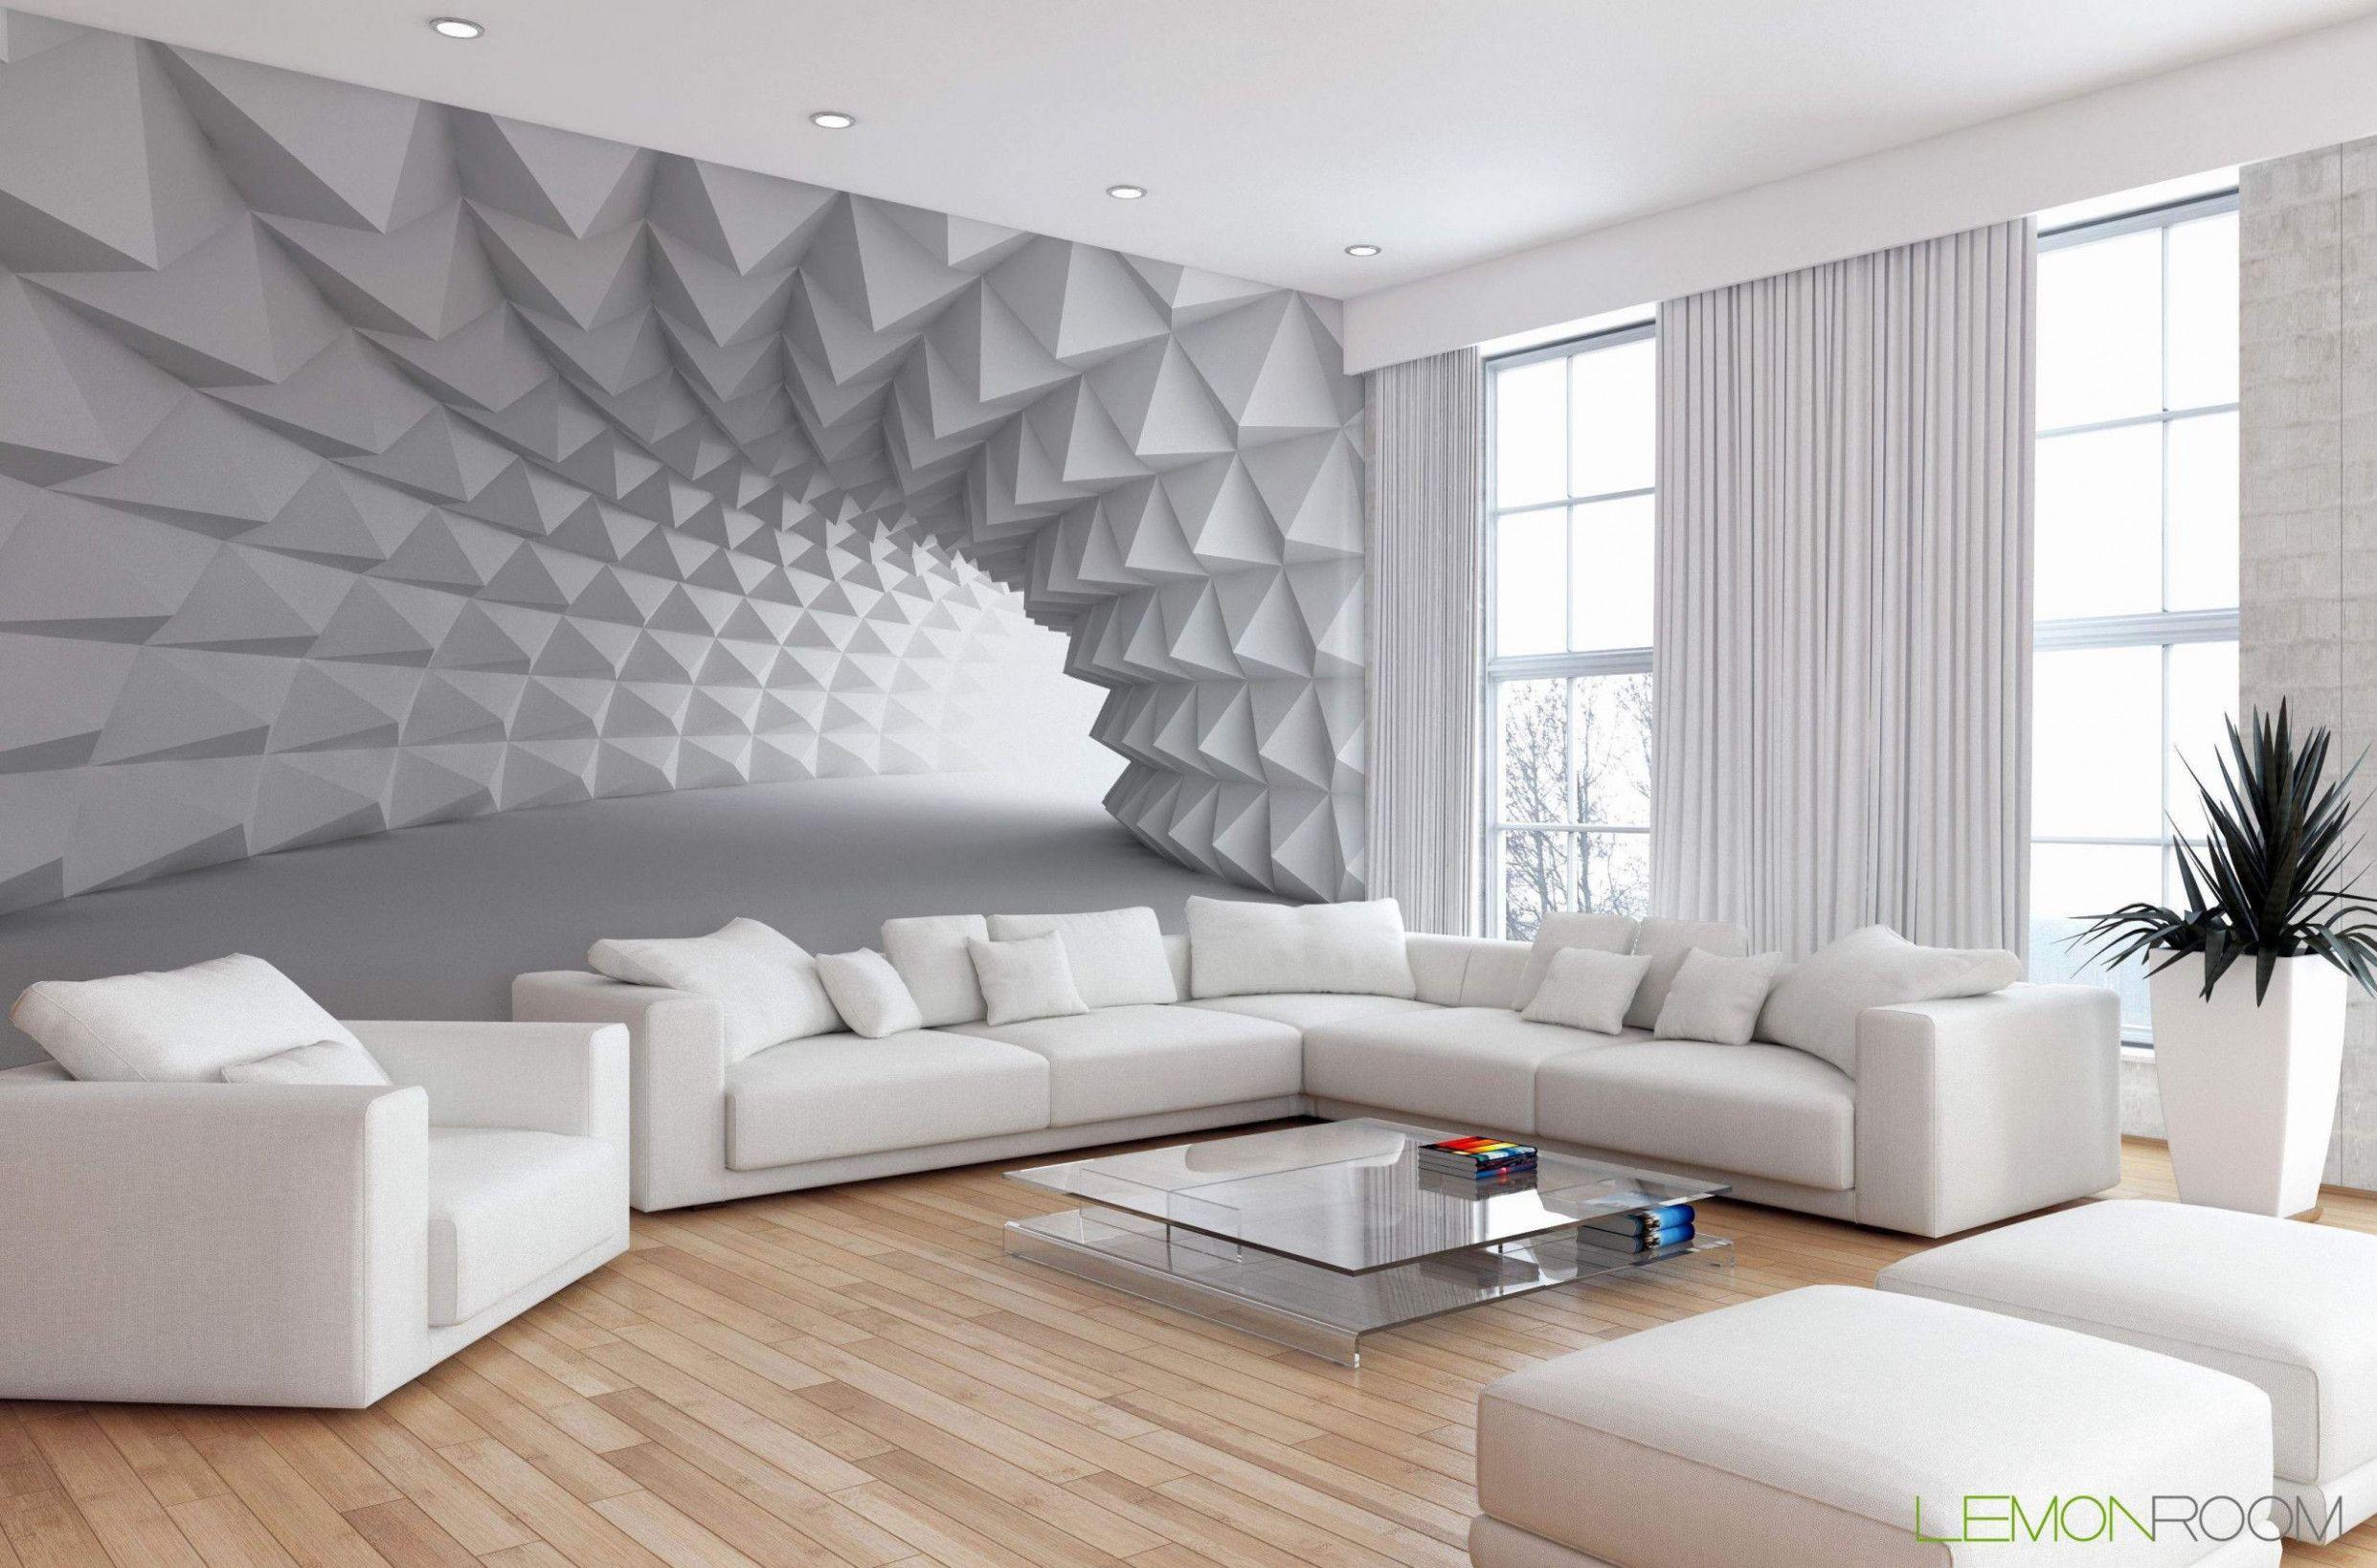 12 tapeten für wohnzimmer ideen di 2020 | dekorasi ruang